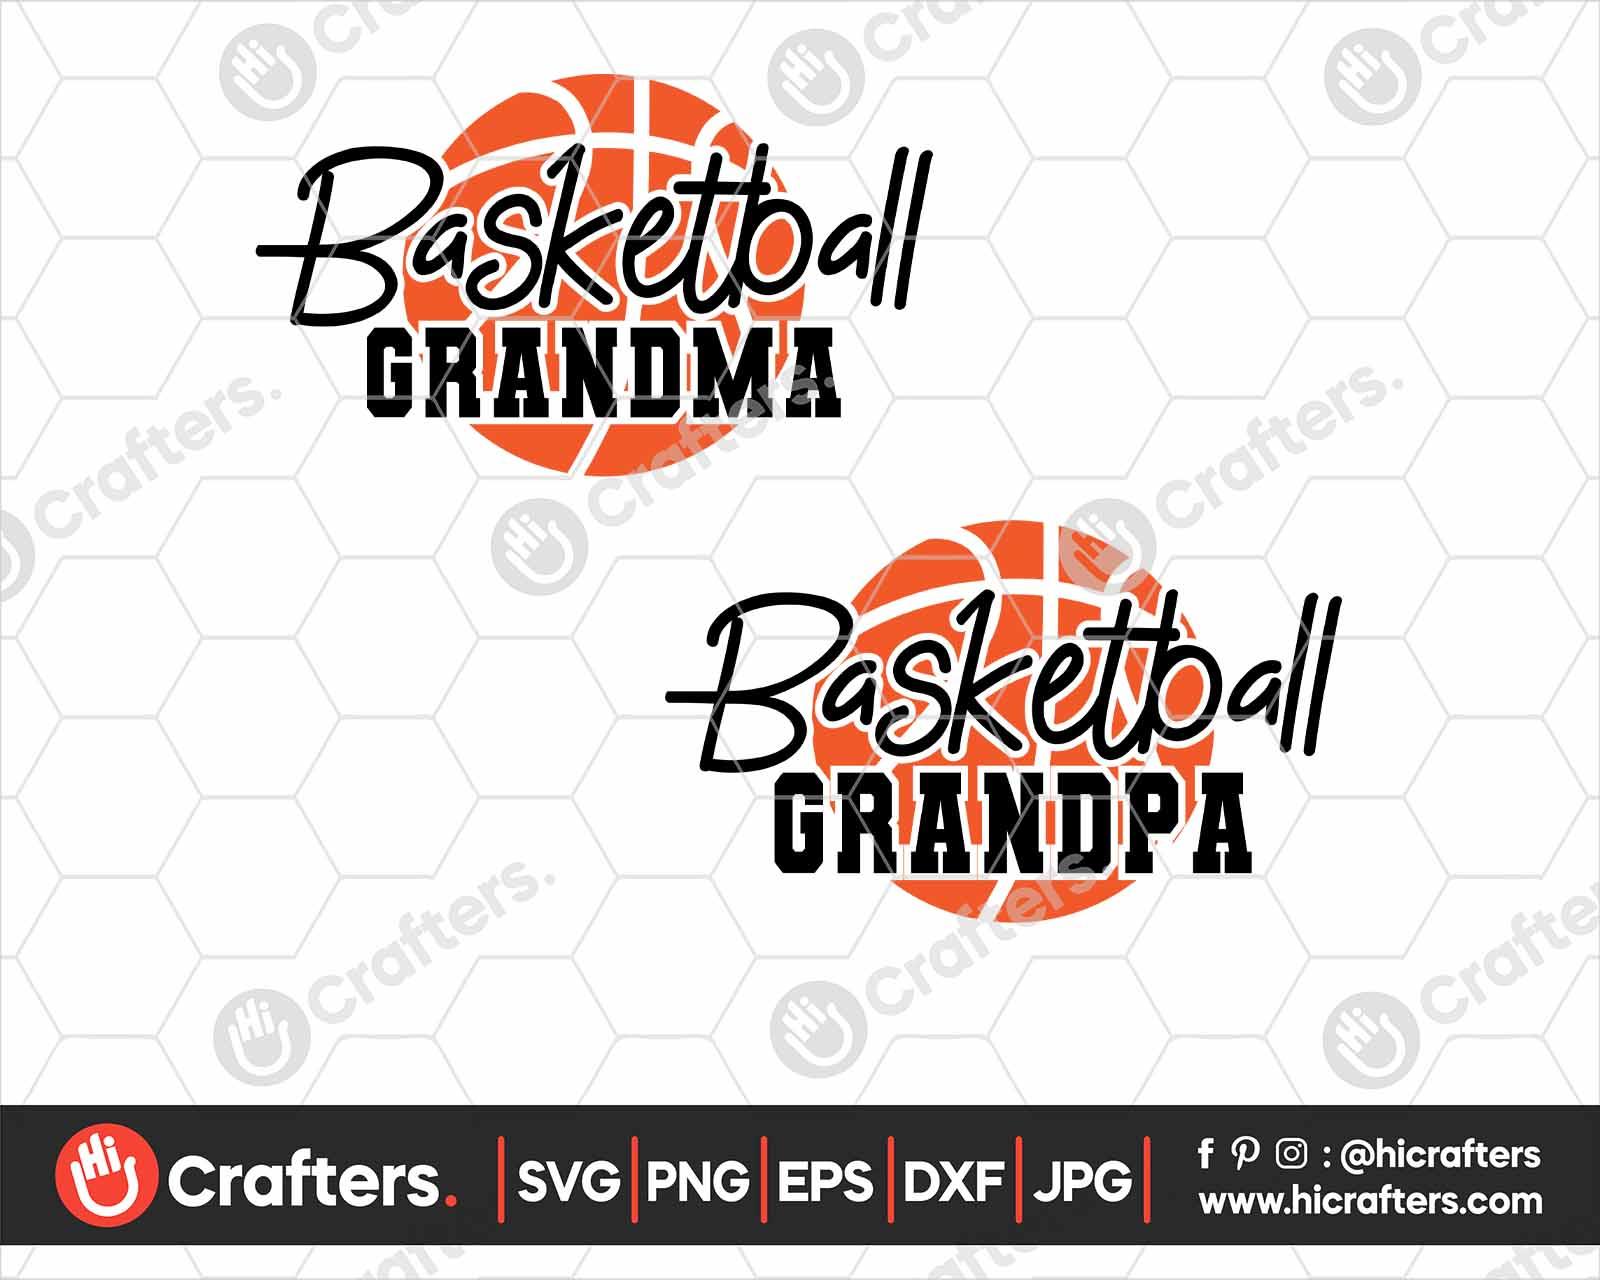 Basketball Grandma Svg Basketball Grandpa Svg Hi Crafters